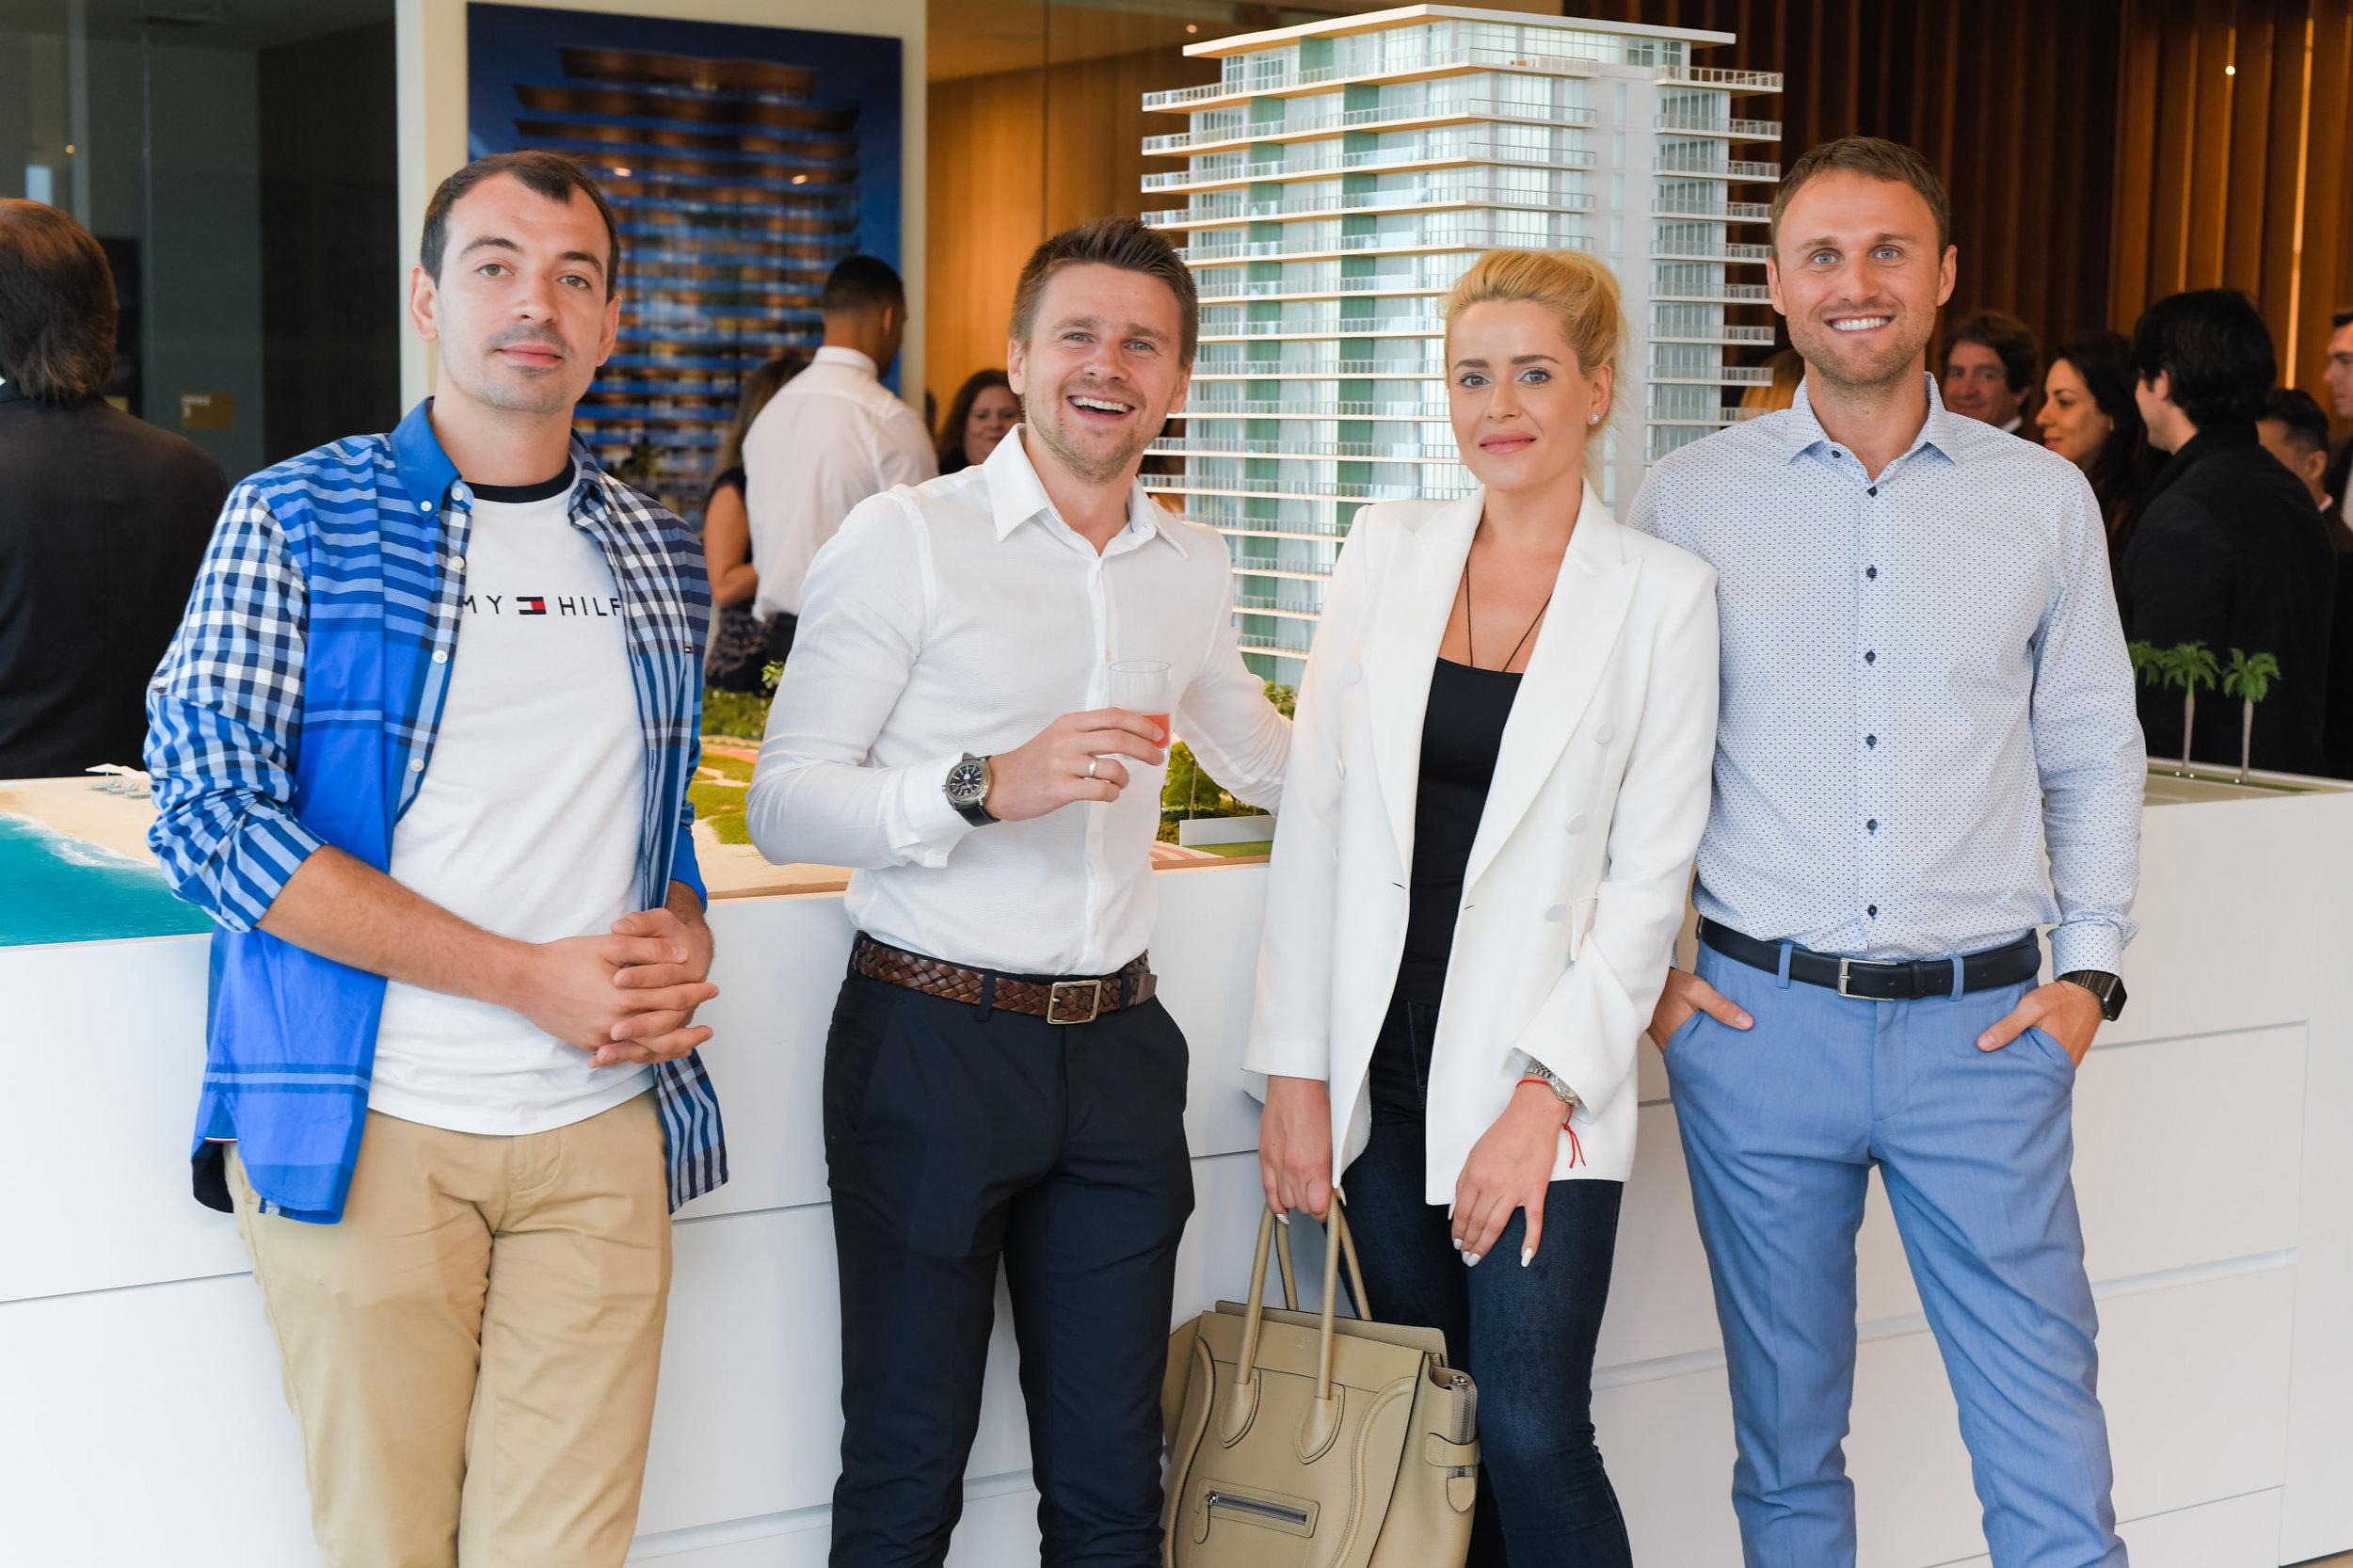 Arthur Rudchenko, Alexandra Fedorova, and Denis Smykalov with guest (far left)